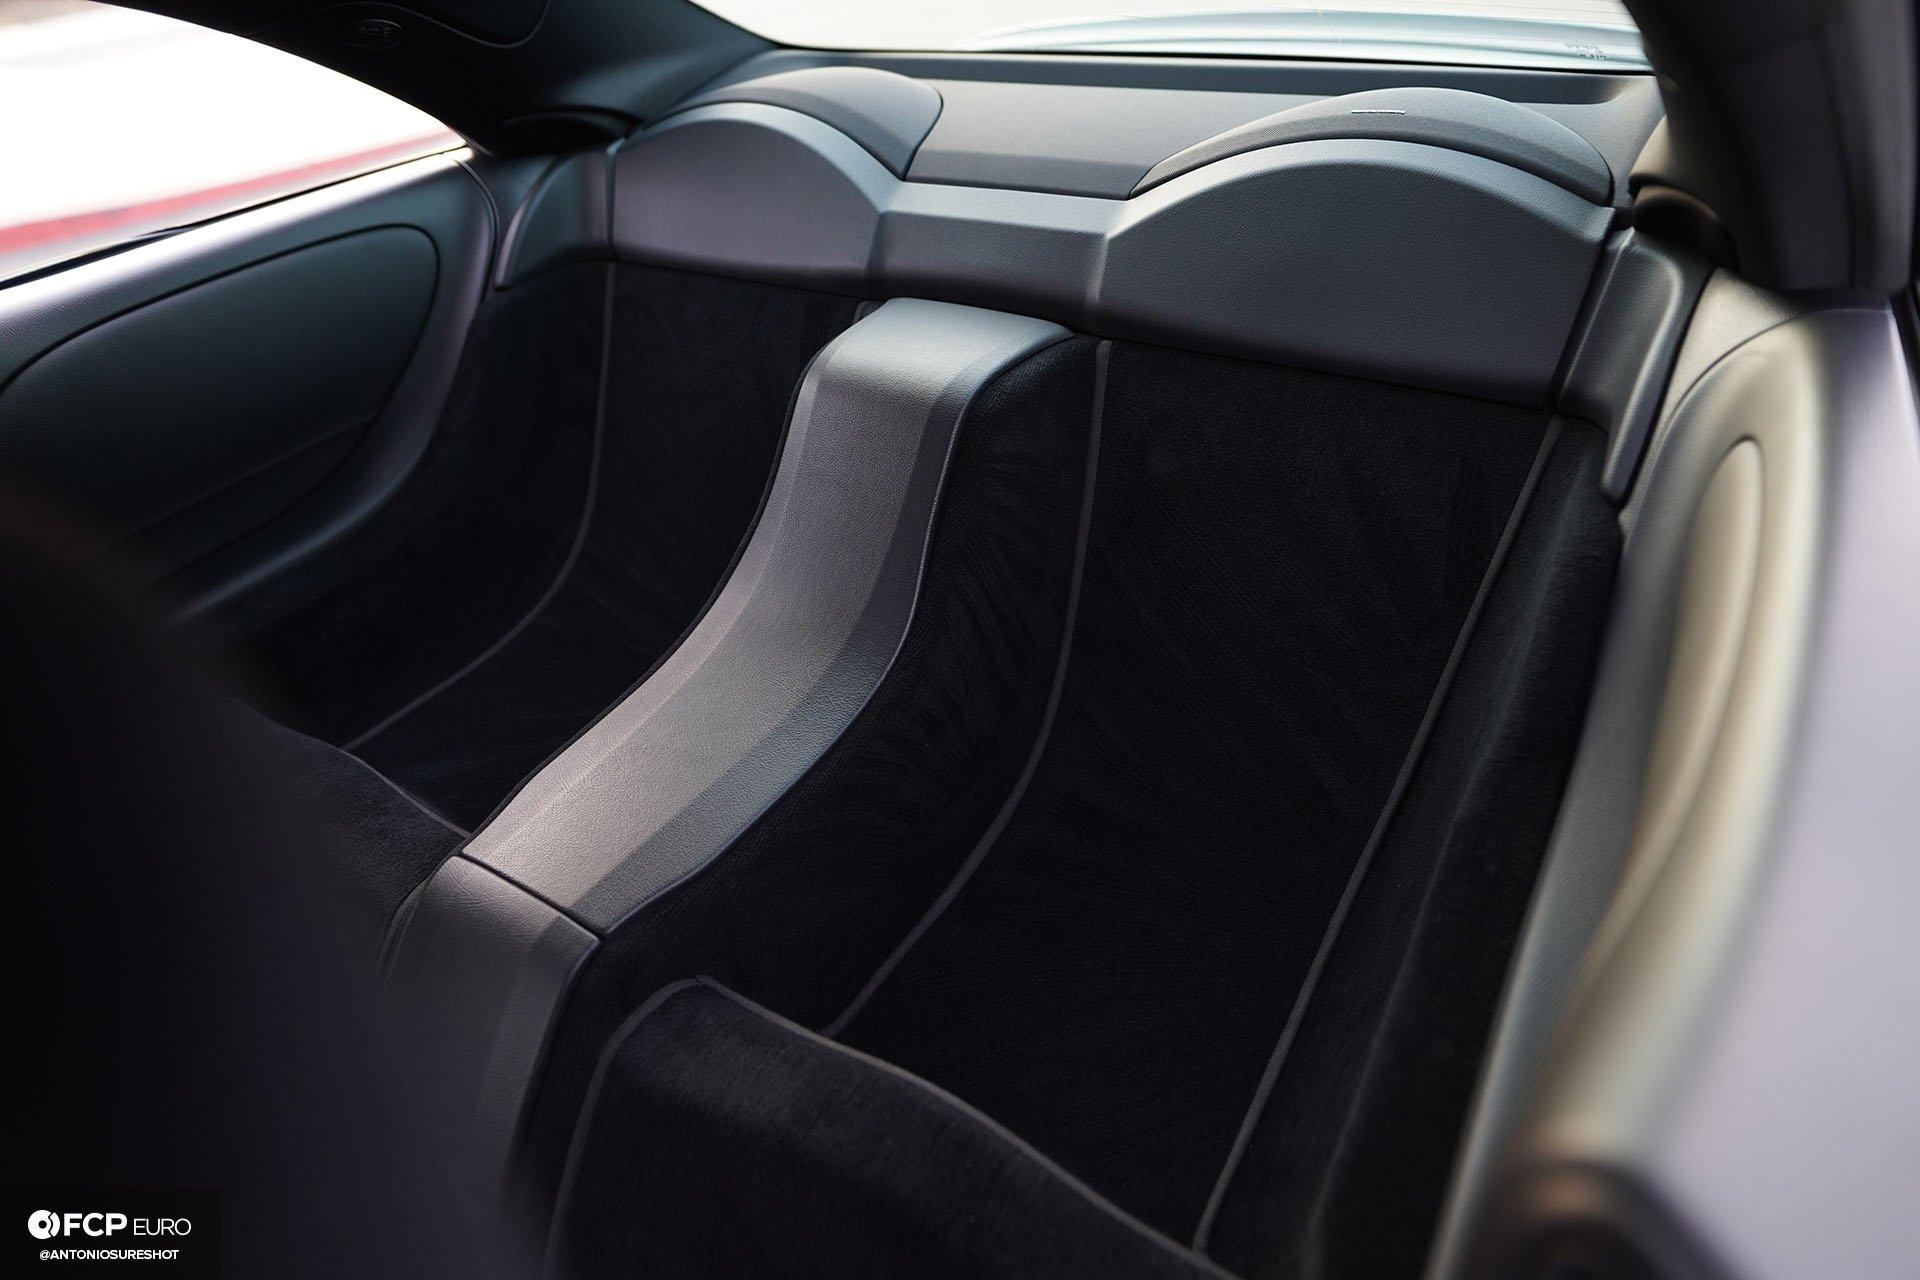 Mercedes Benz AMG CLK63 Black Series